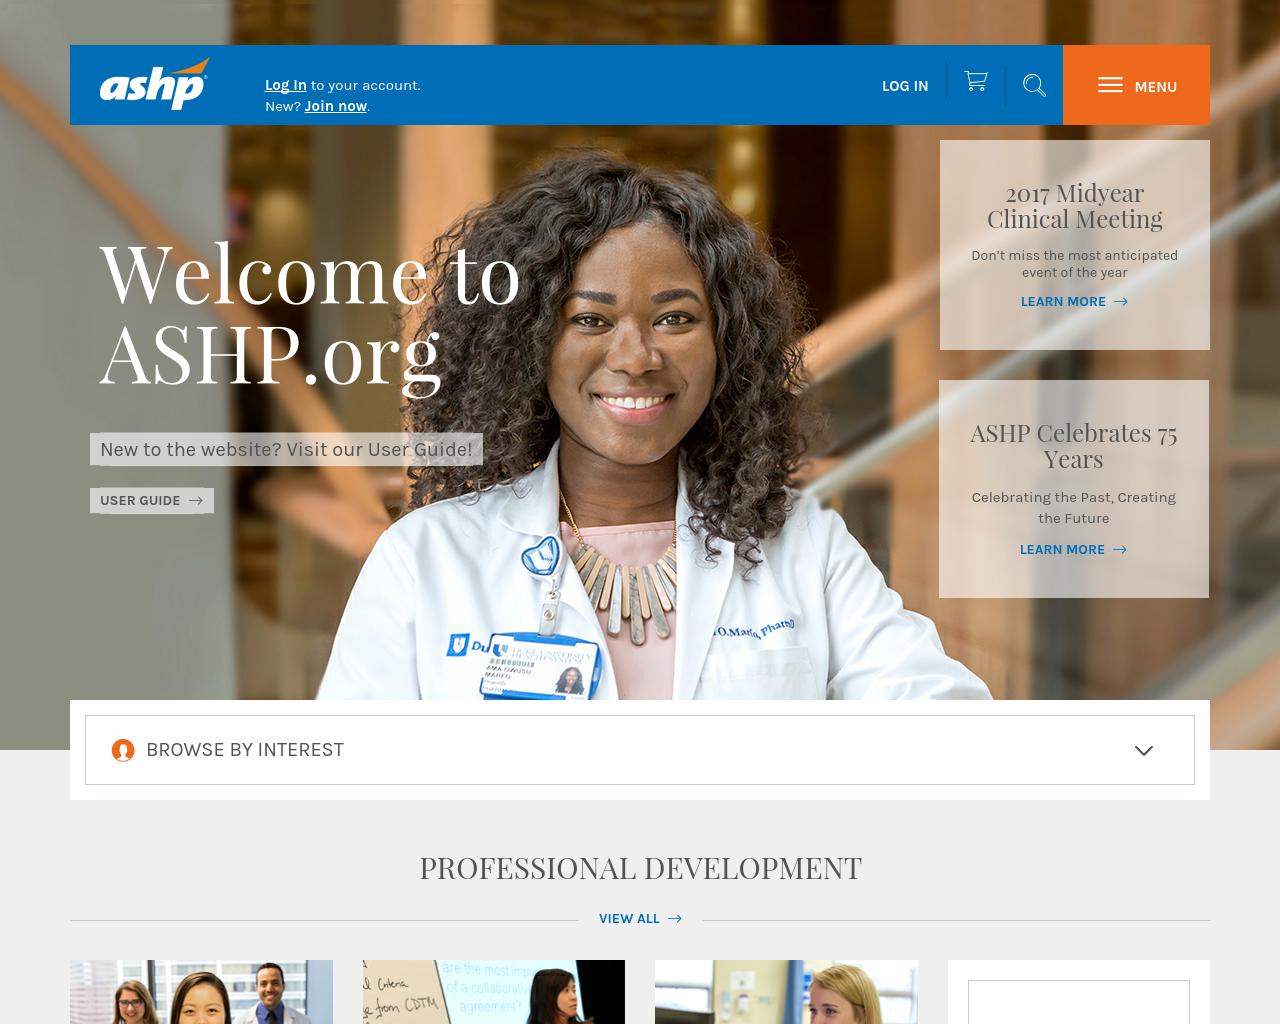 ASHP-Advertising-Reviews-Pricing